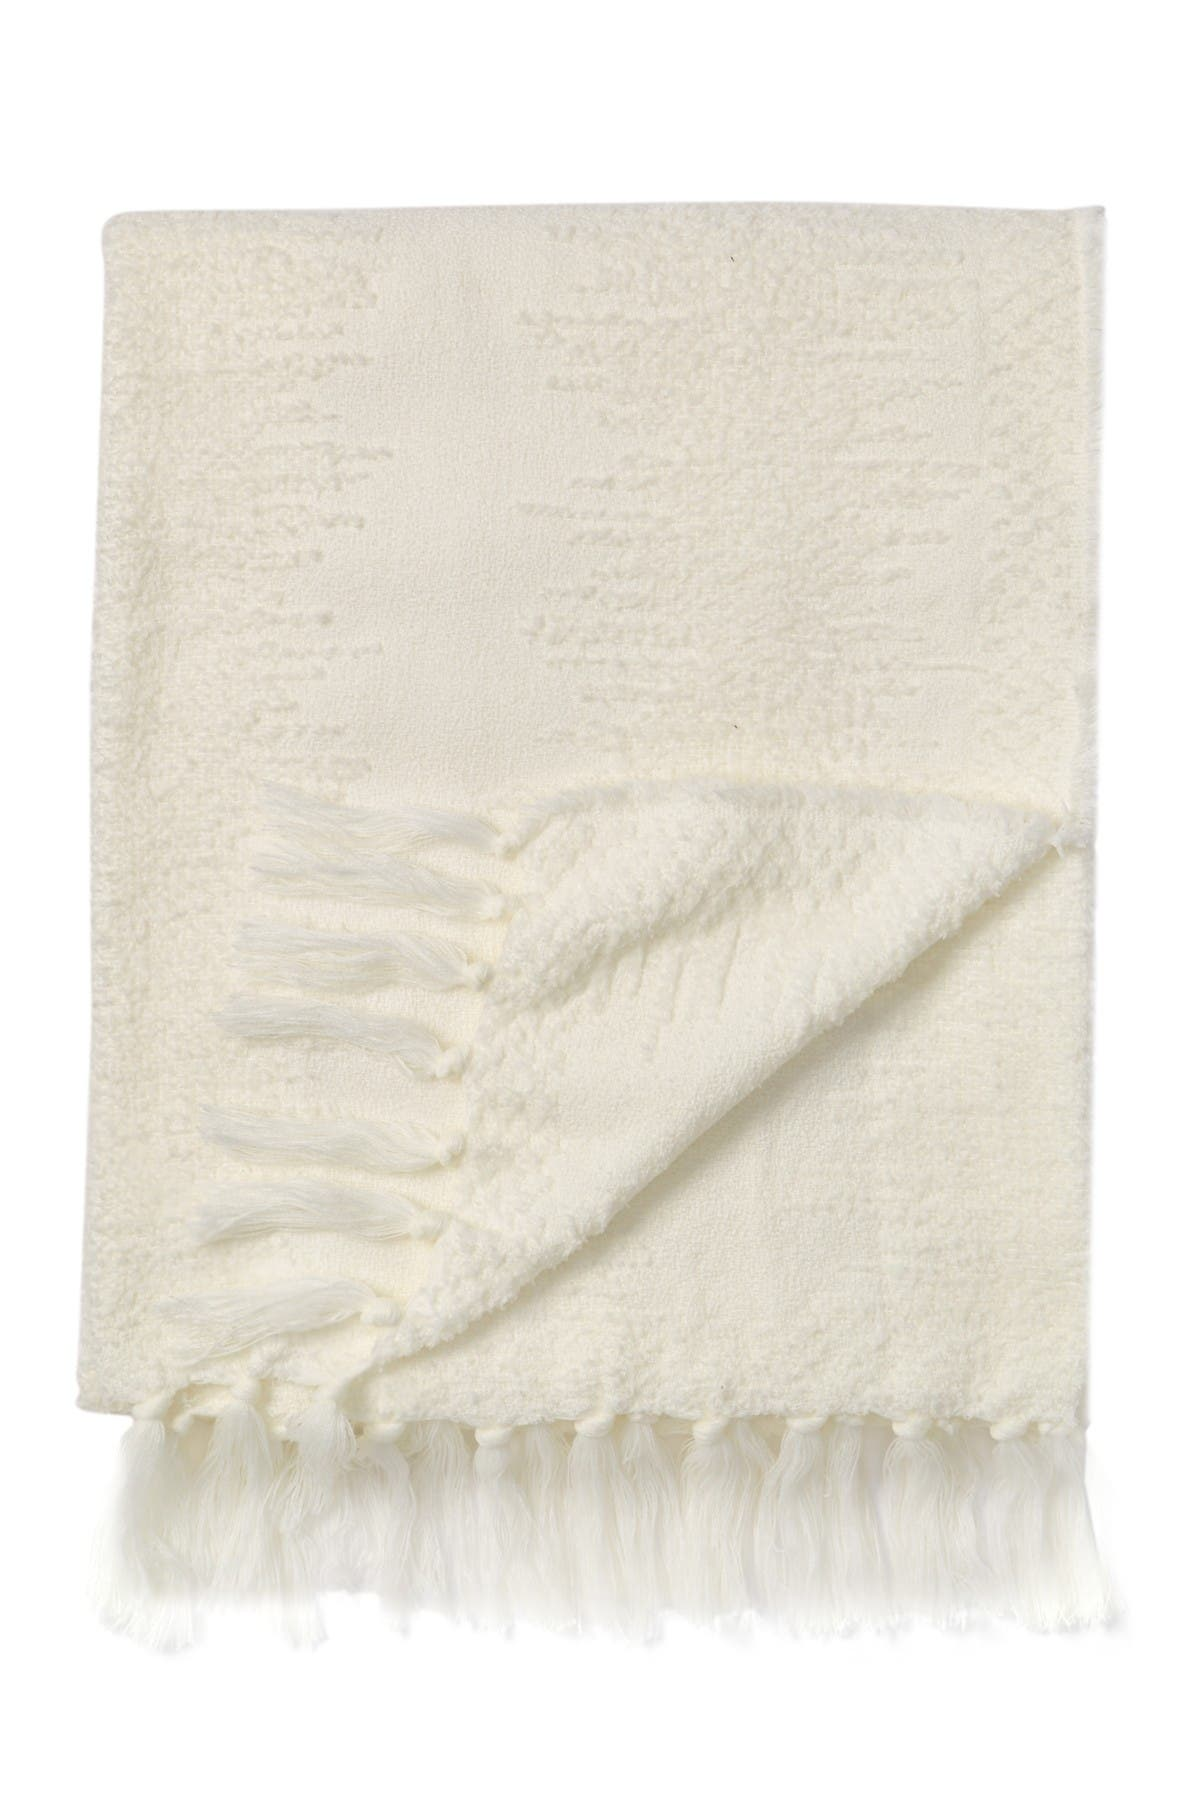 Image of Nordstrom Rack Textured Throw Blanket